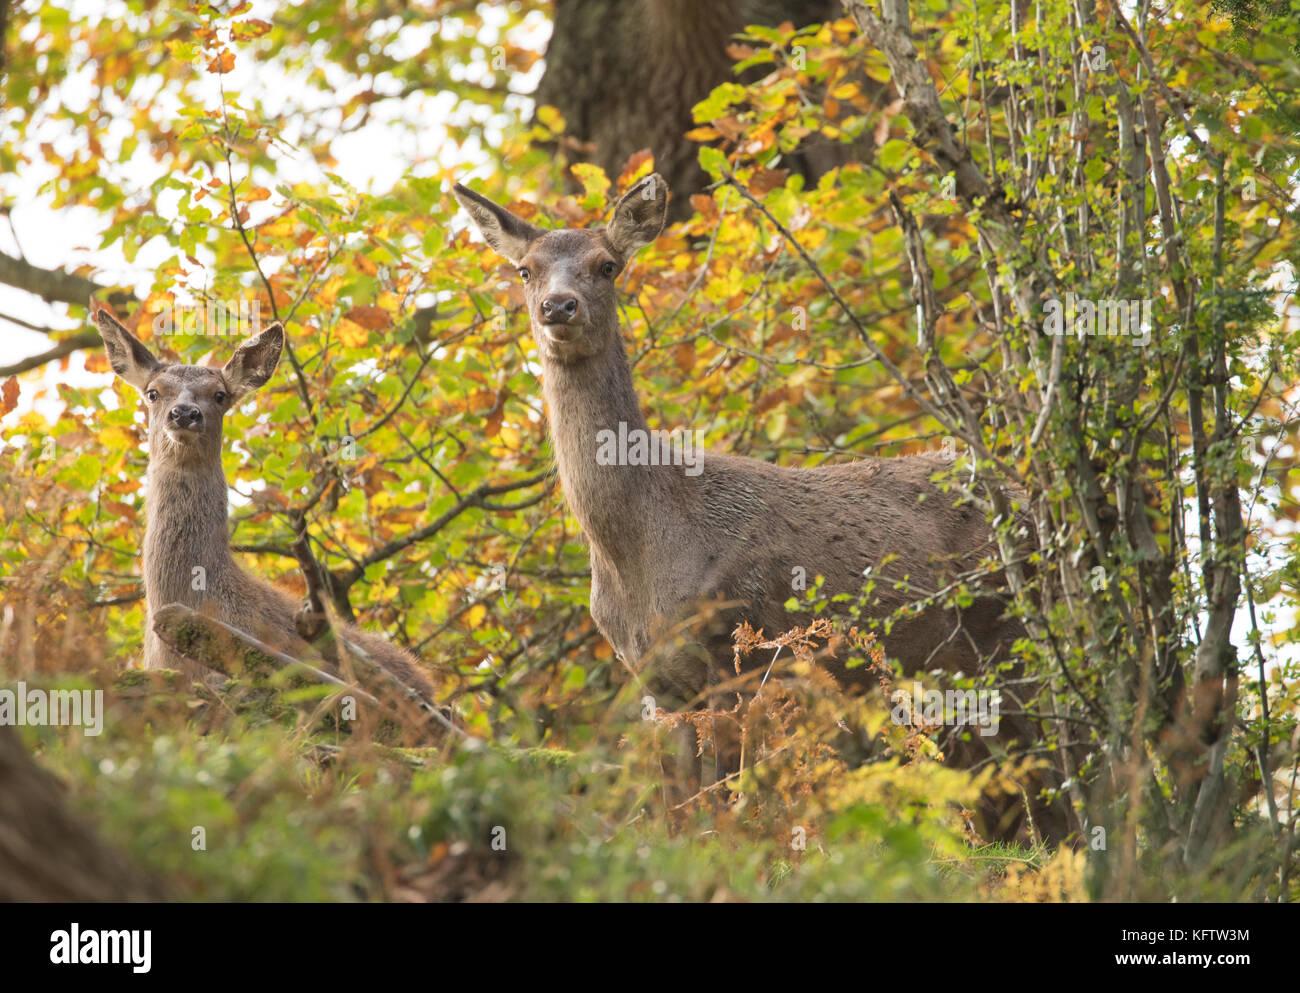 Red Deer hinds en la alerta en Woodland, Gales, Reino Unido. Imagen De Stock